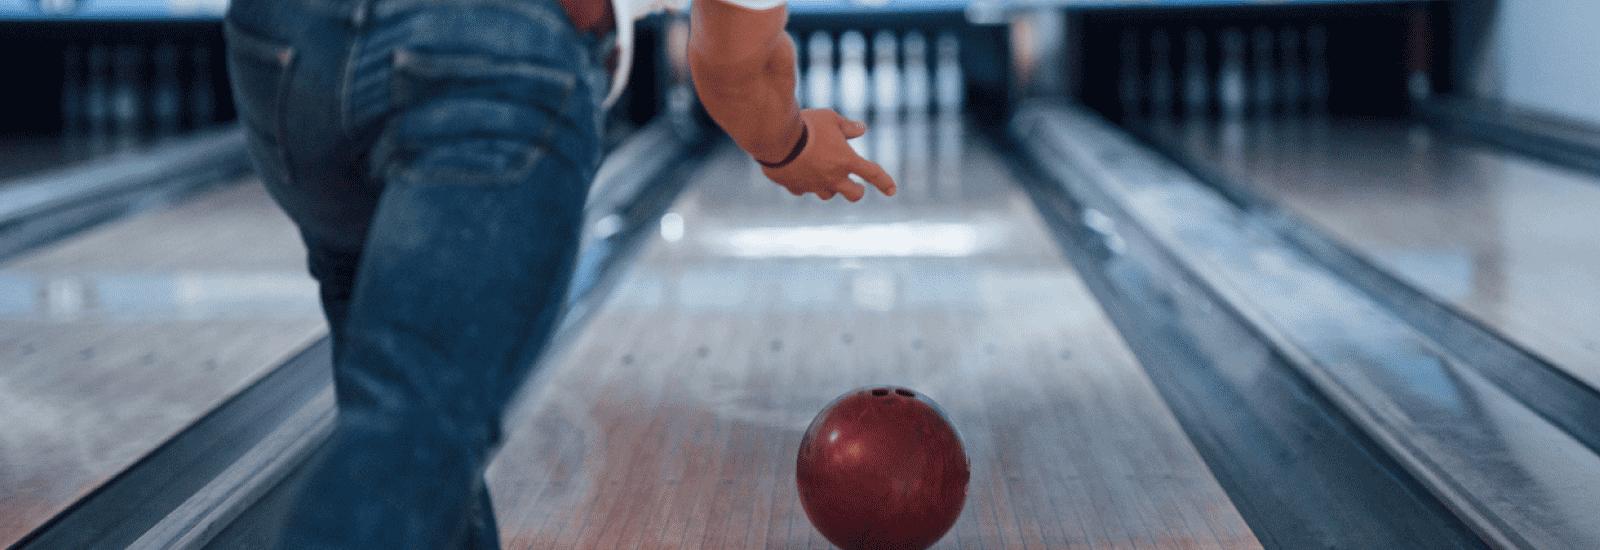 Fort Leavenworth Bowling Alley